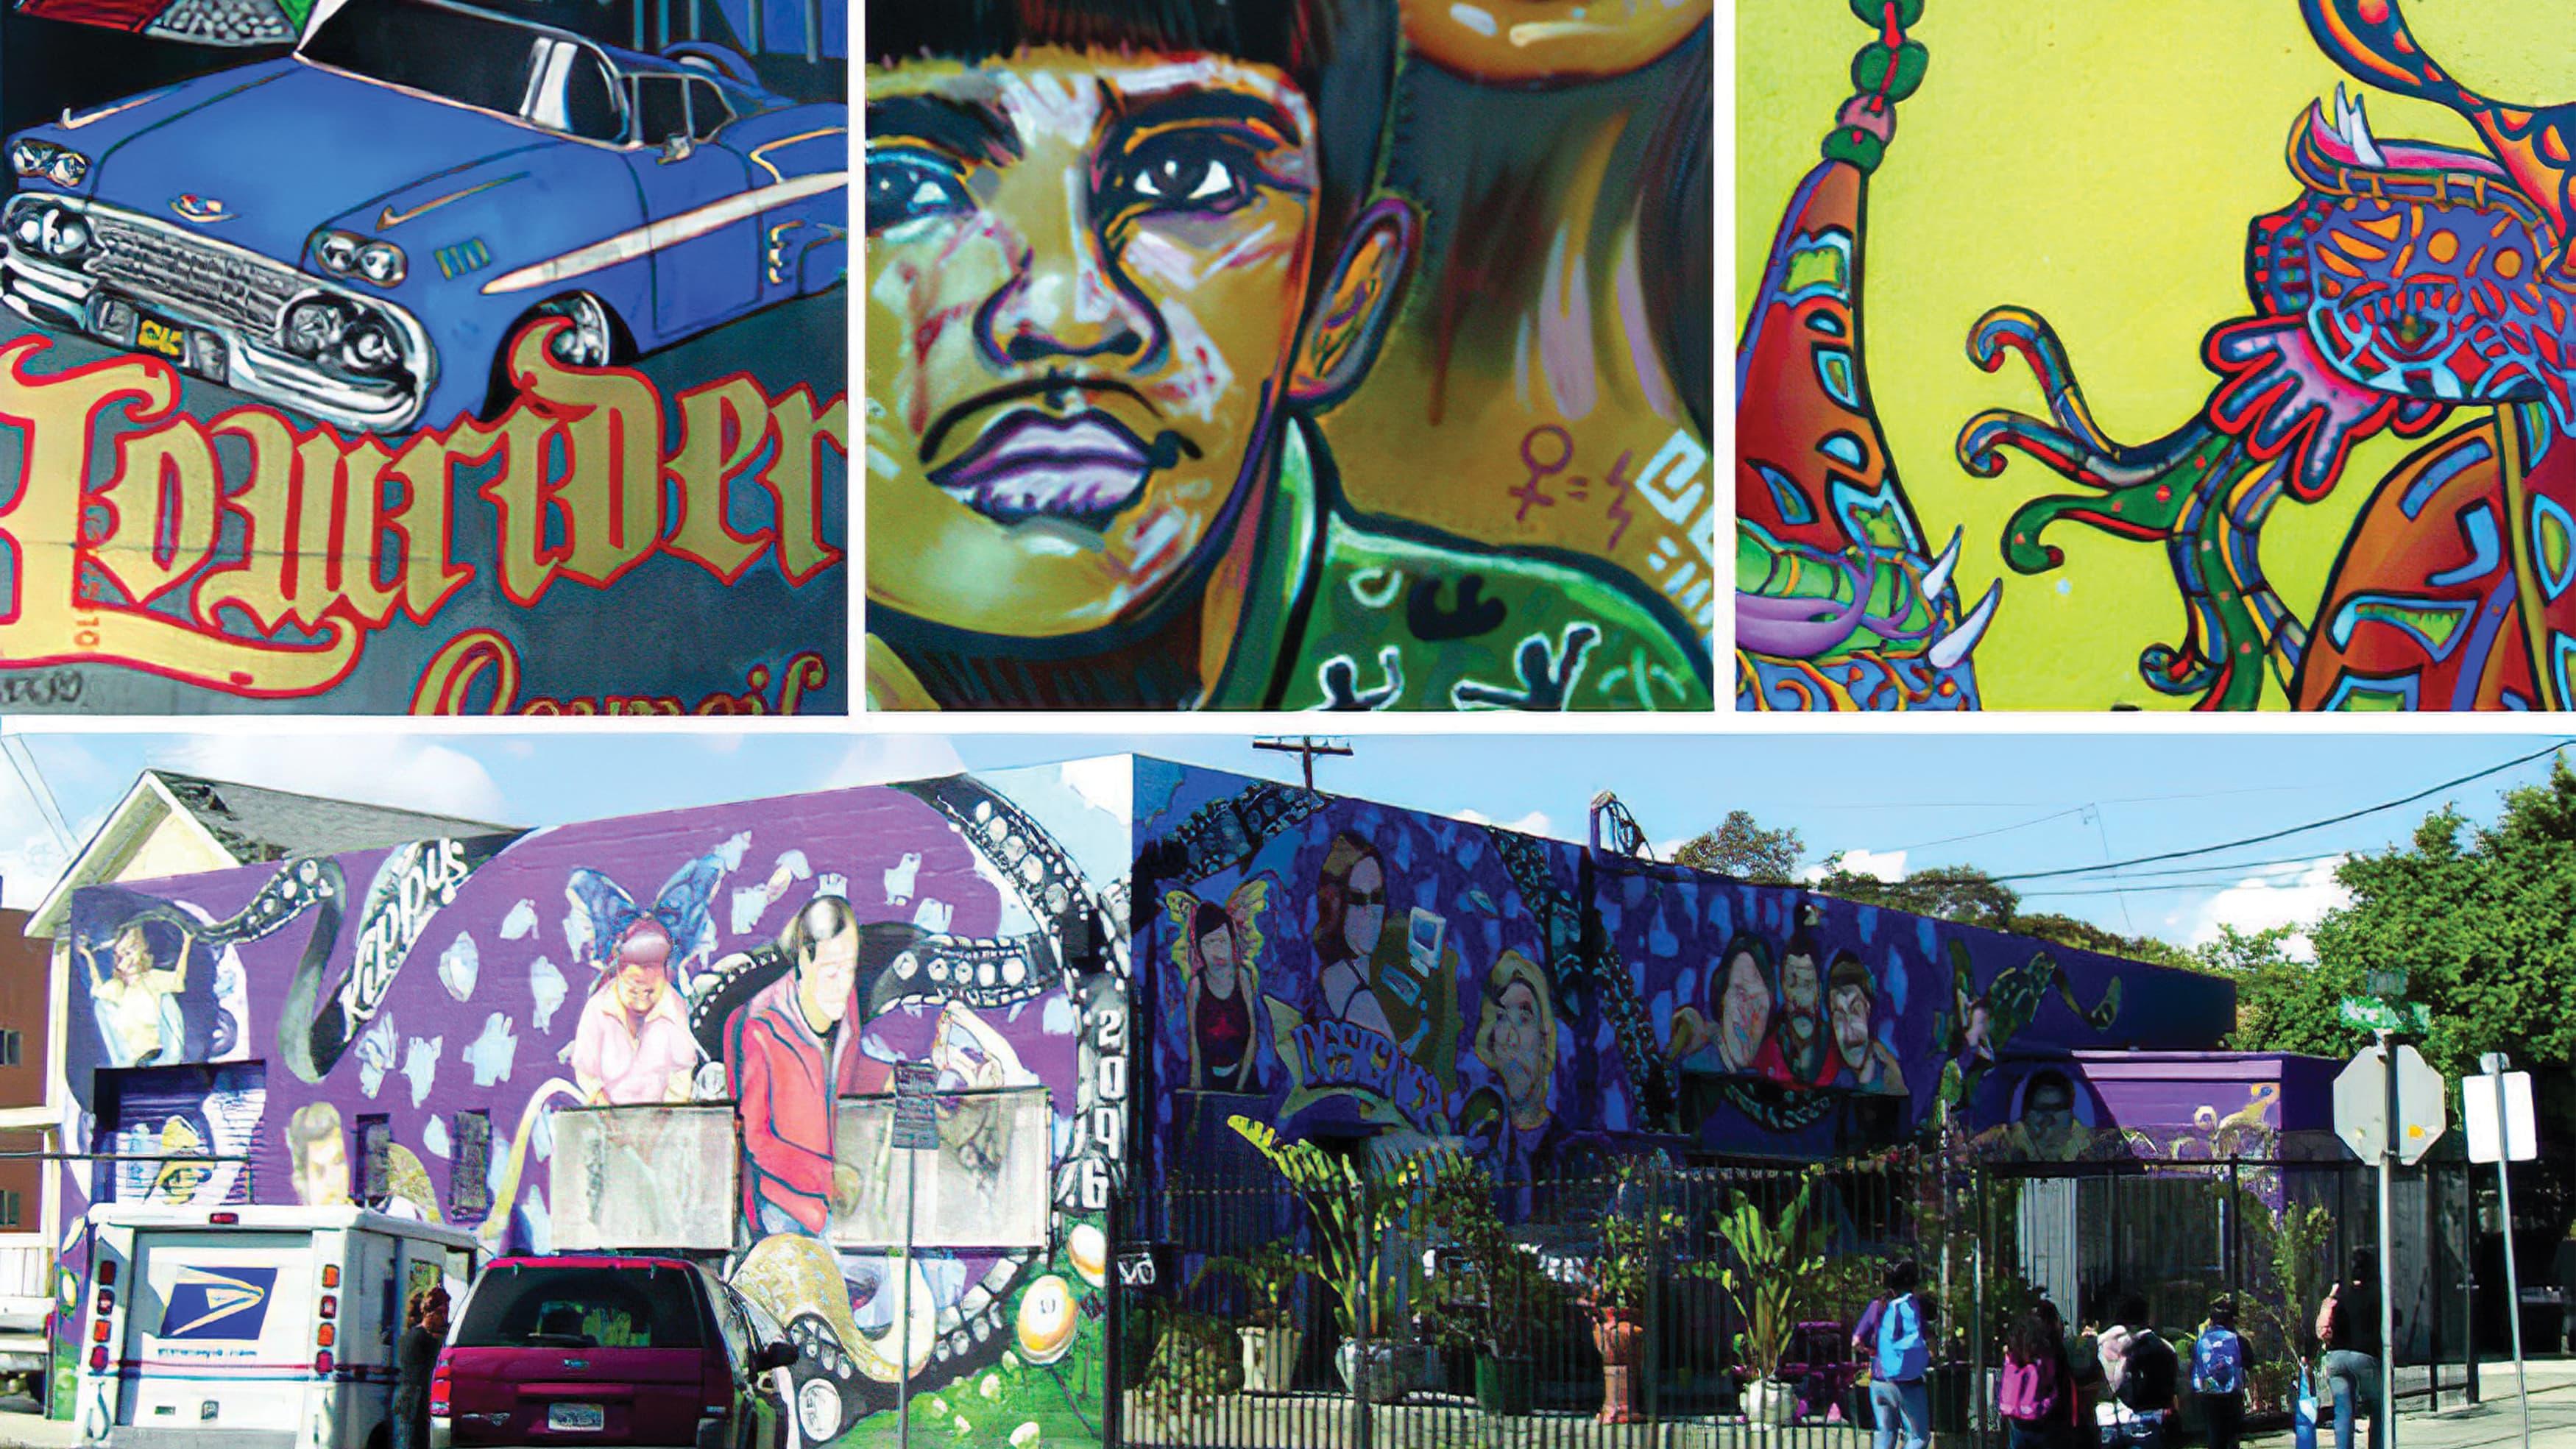 Collage of images taken around Barrio Logan, a neighborhood in San Diego